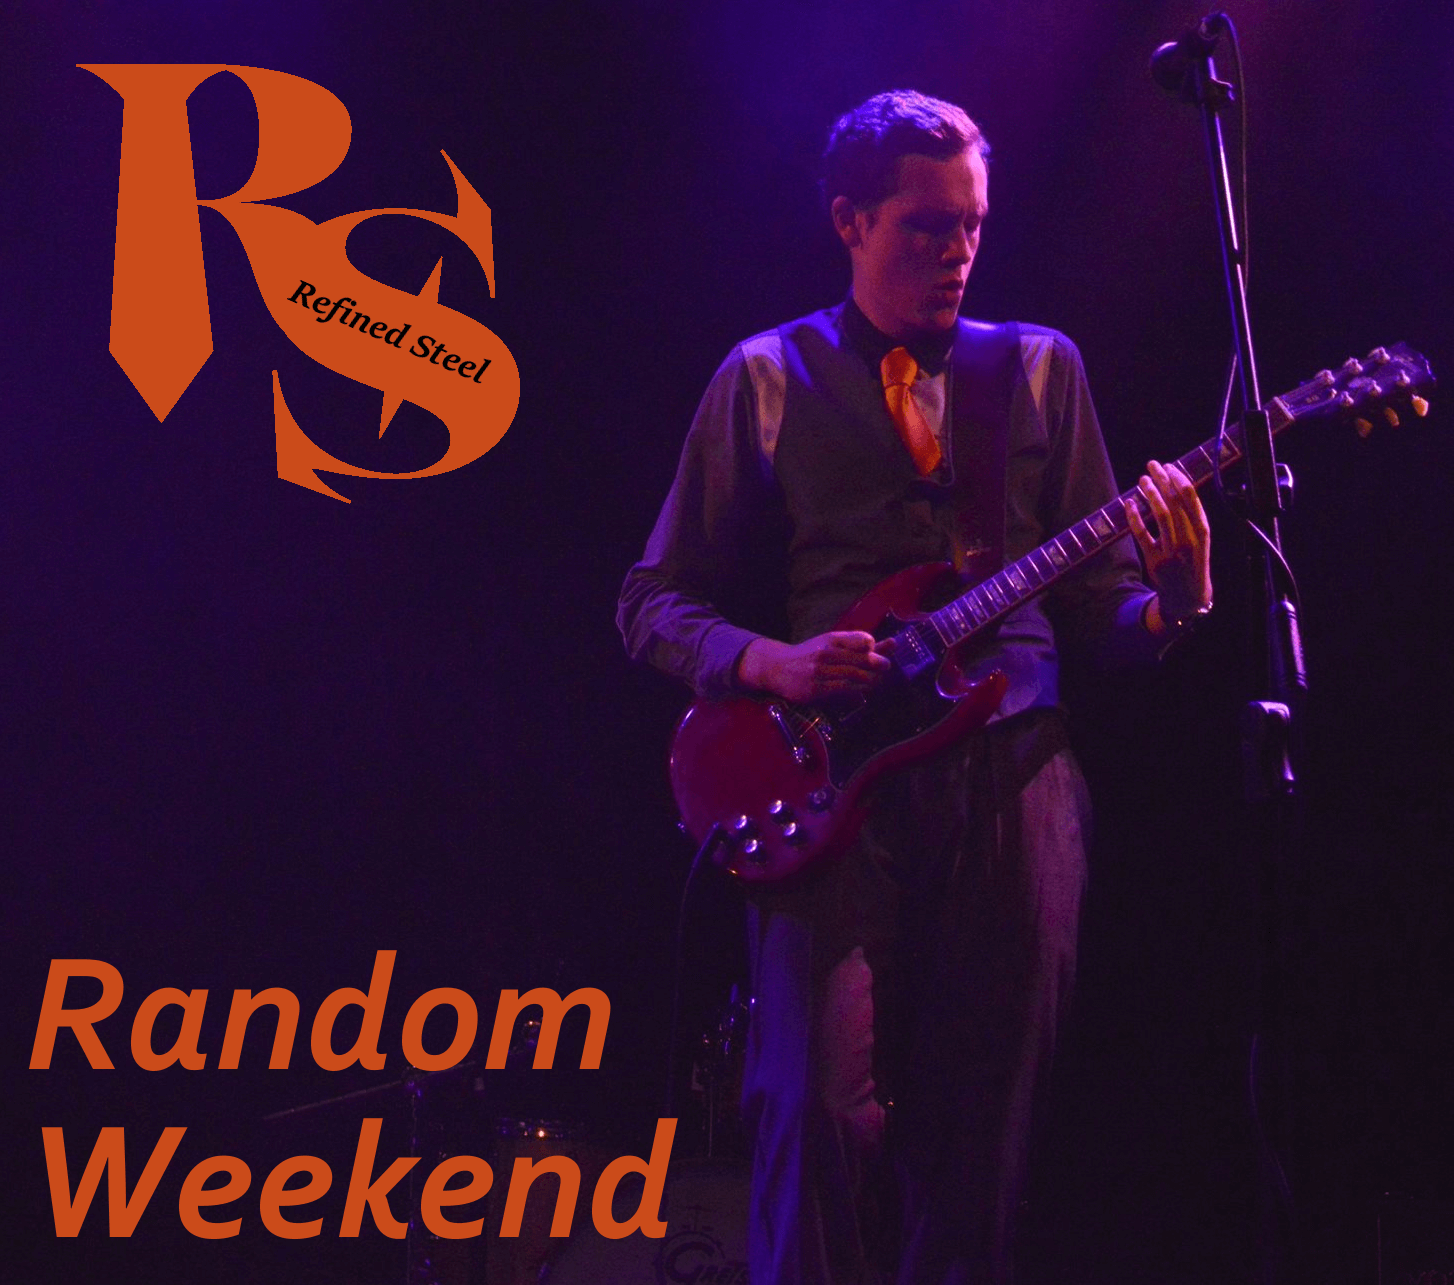 Random Weekend Cover (small)